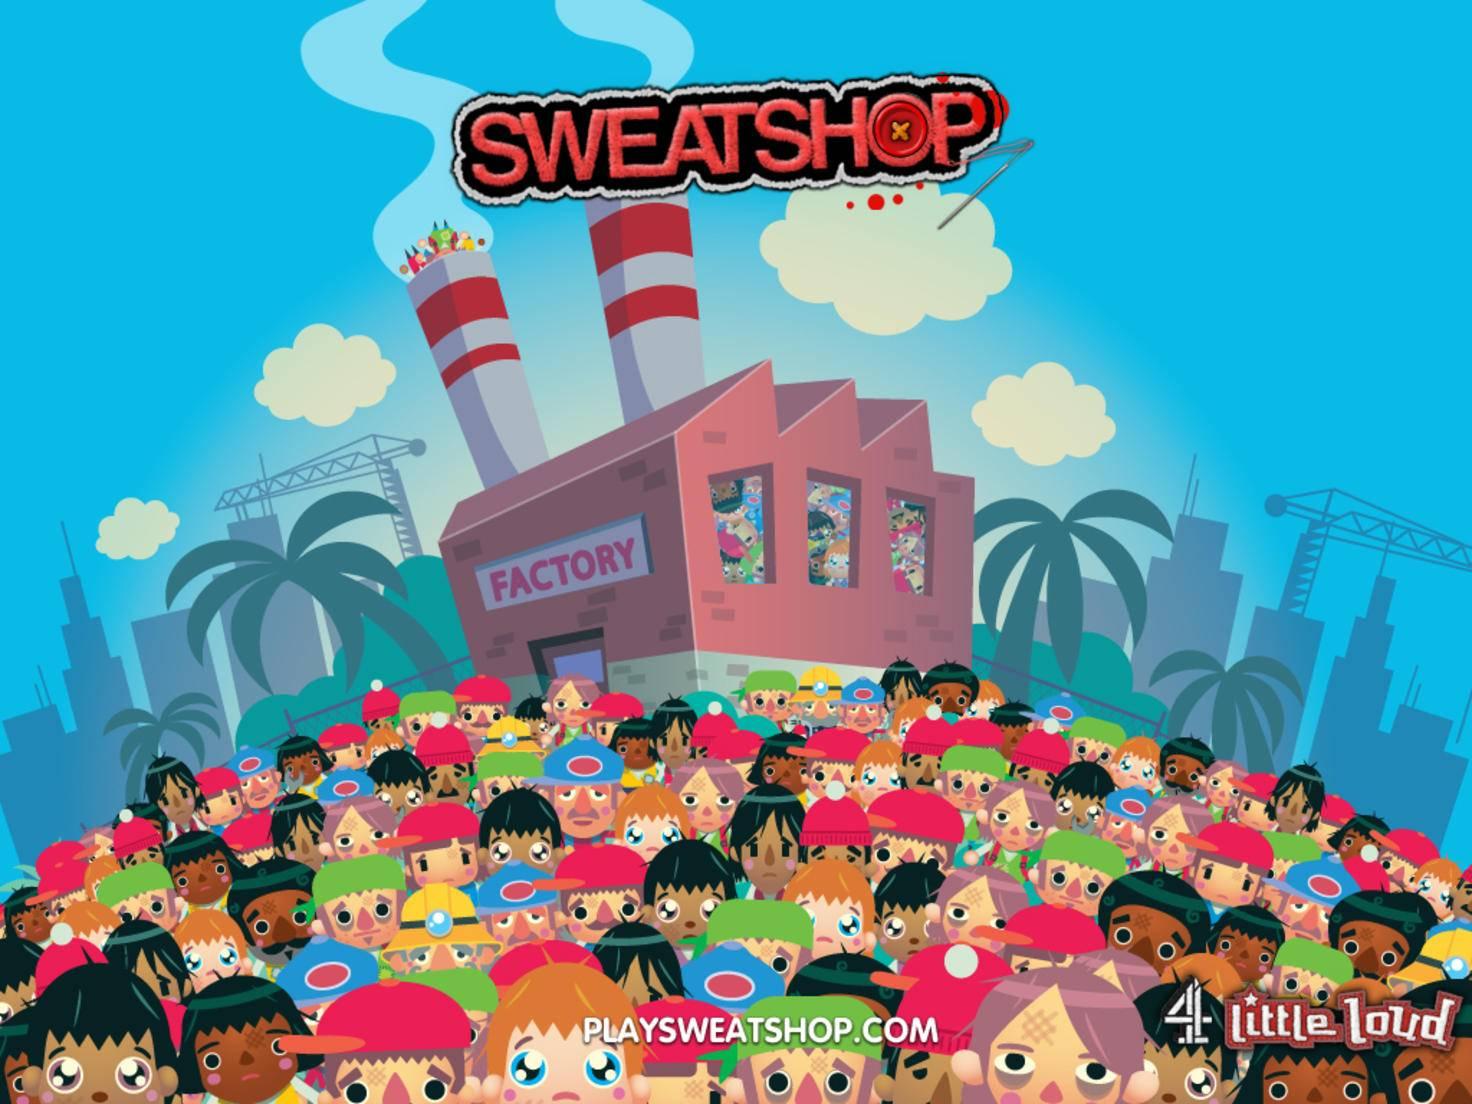 sweatshop_1_1024